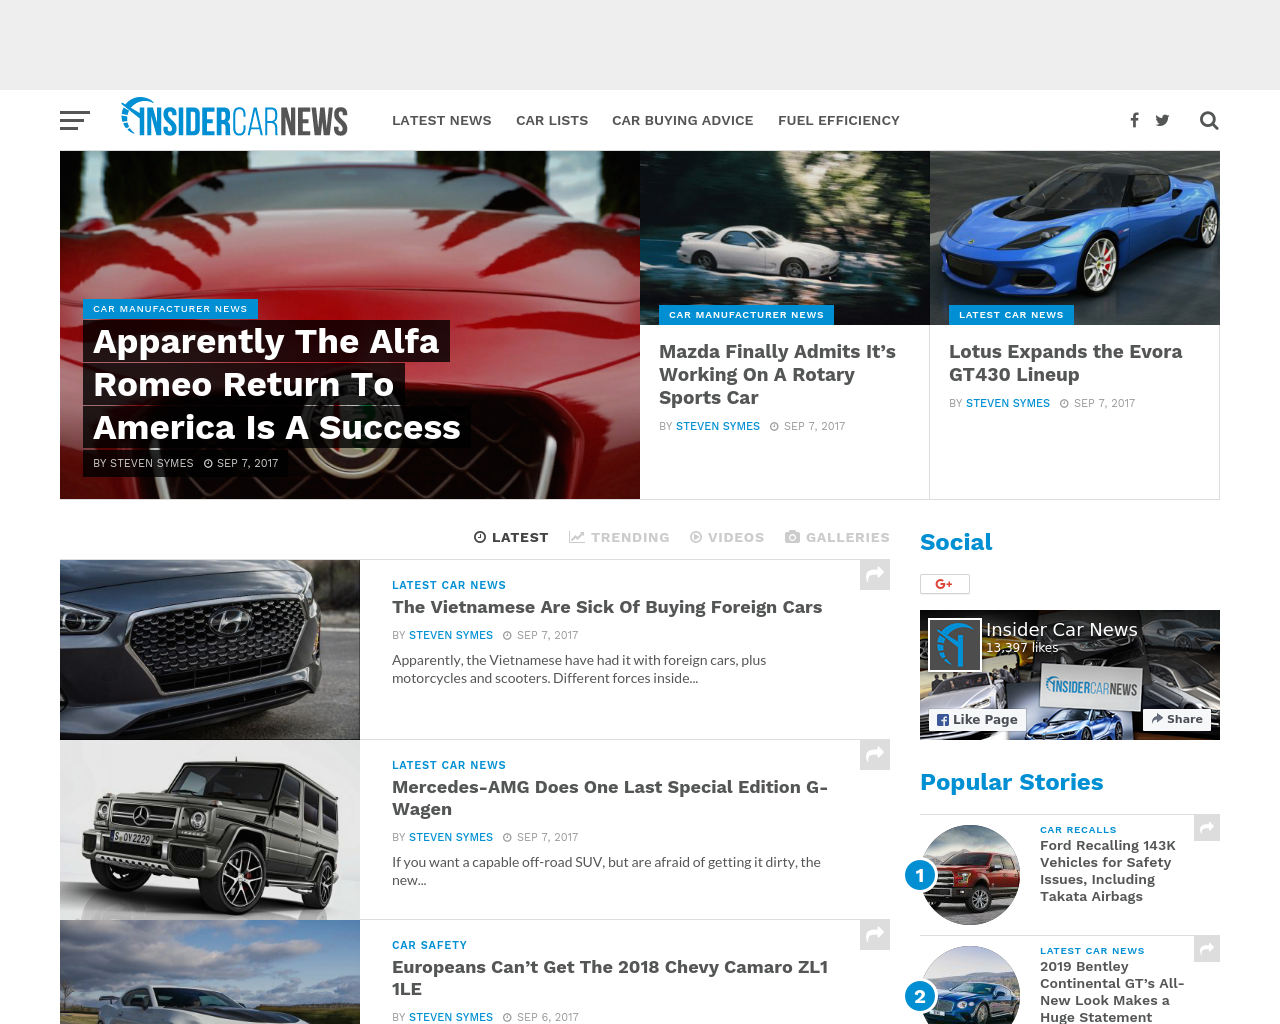 Insider-Car-News-Advertising-Reviews-Pricing